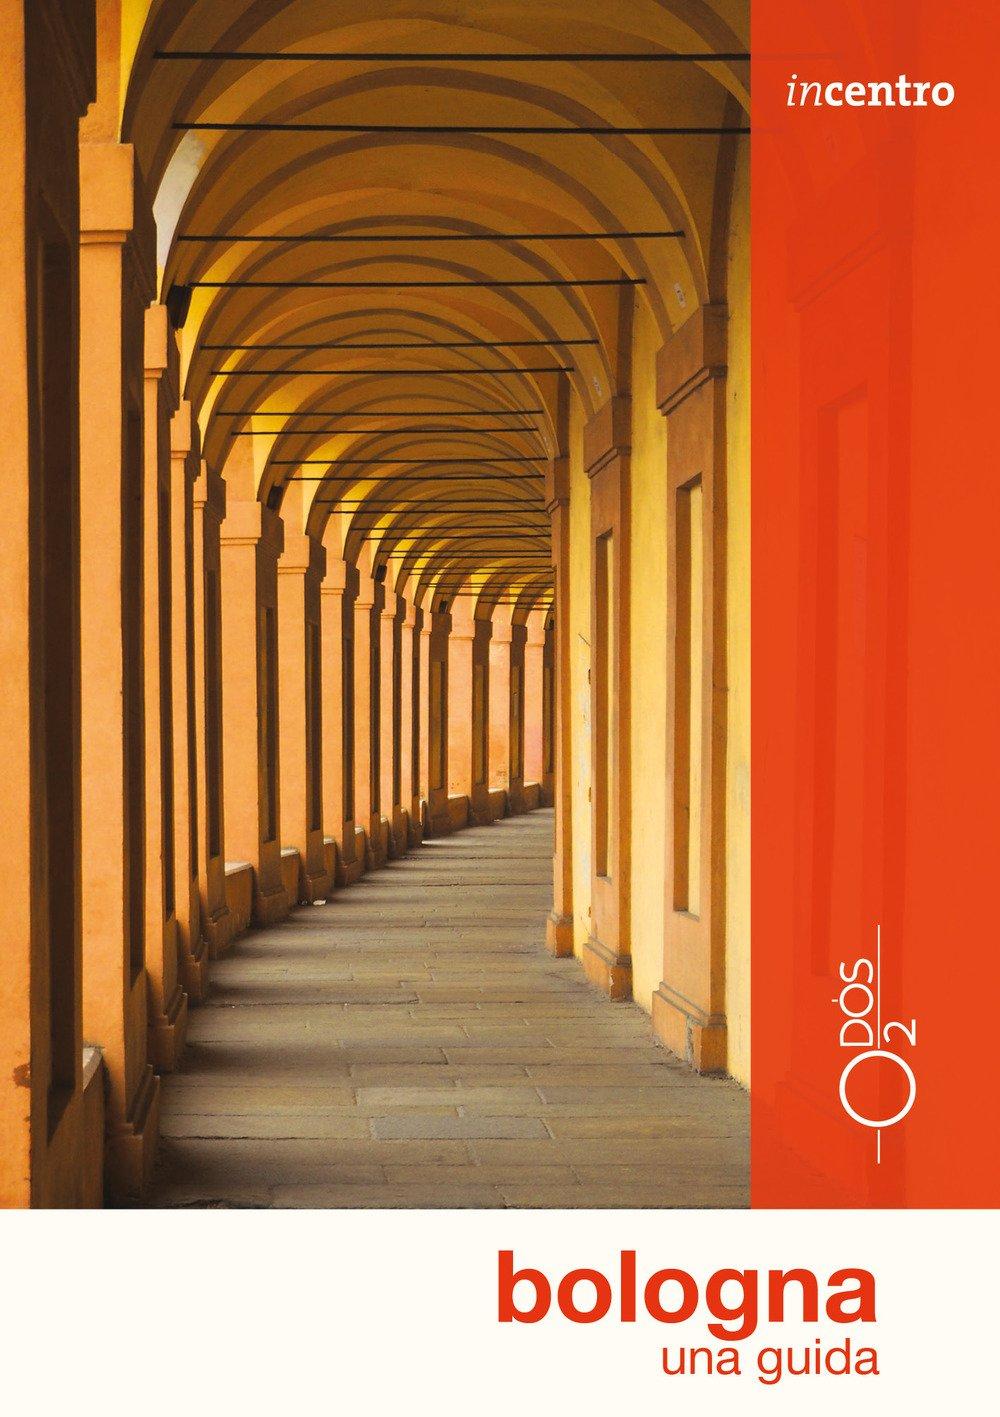 Bologna. Una guida Copertina flessibile – 13 giu 2017 Sara Urbani Marco Boscolo Odós (Udine) 8896303427